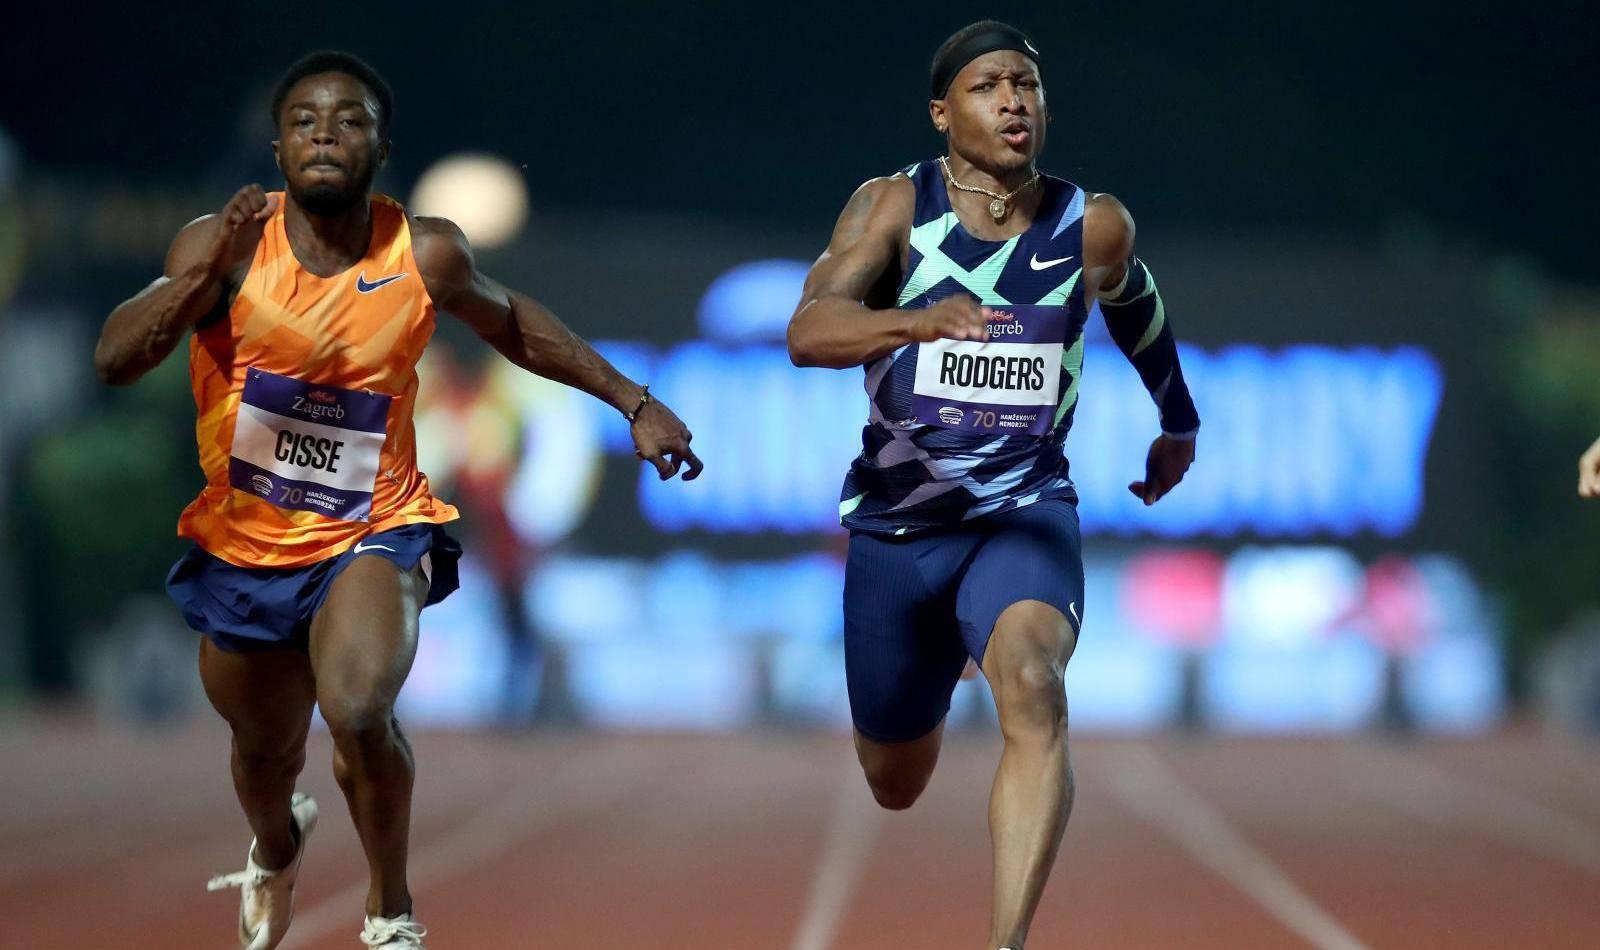 Zagreb: 70. memorijal Borisa Hanžekovića, 100m, muški